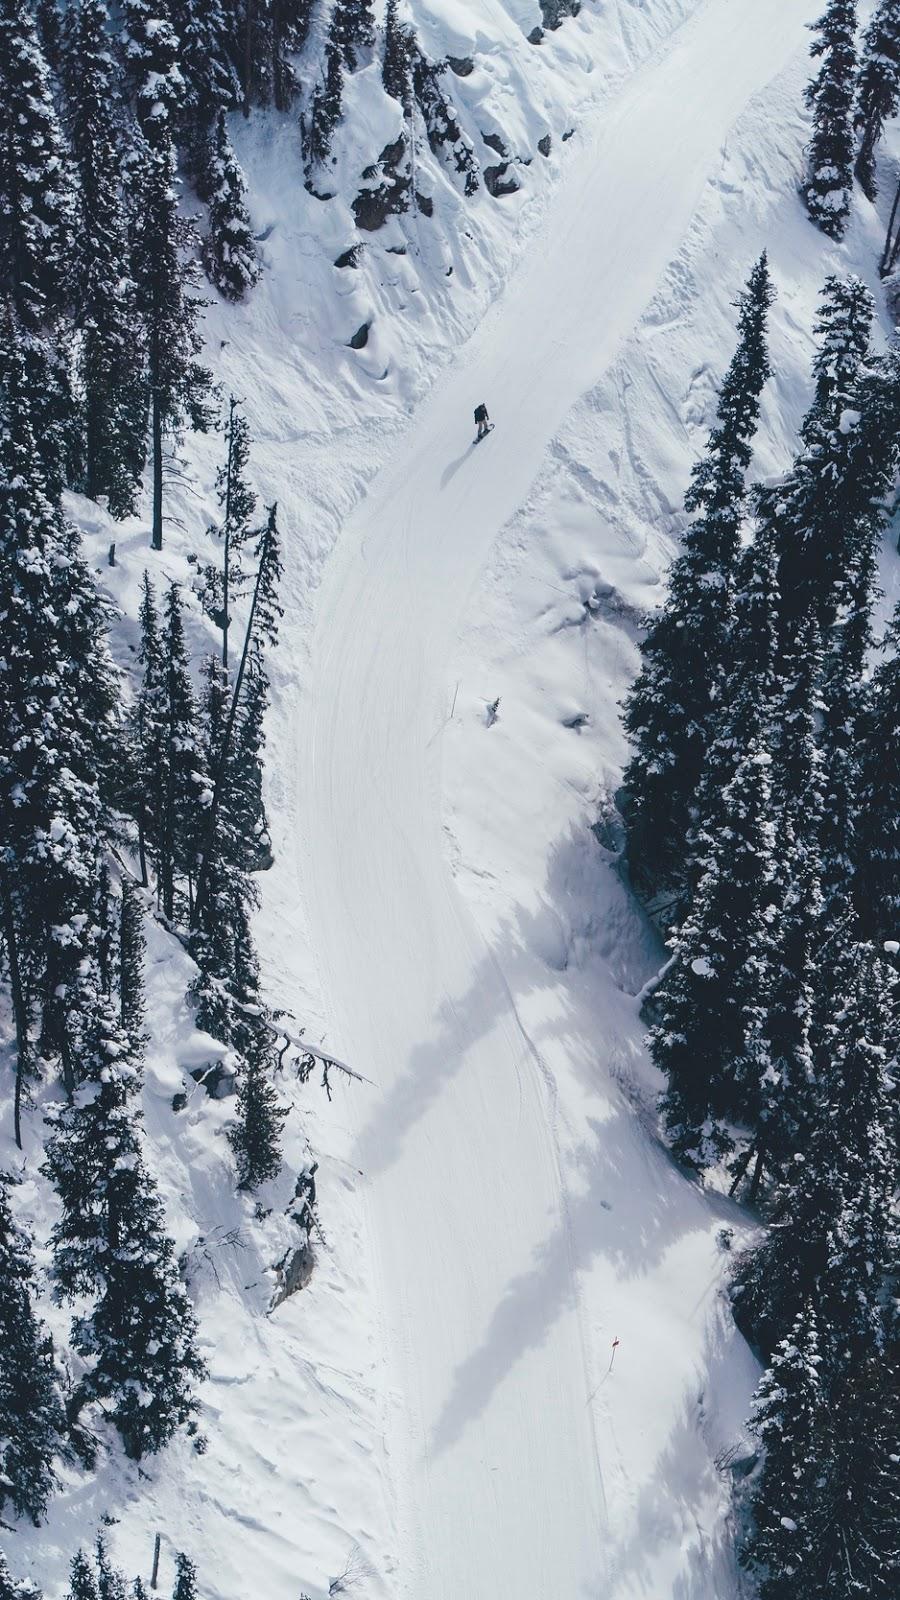 Snow Wallpaper 4k iPhone Winter 2020